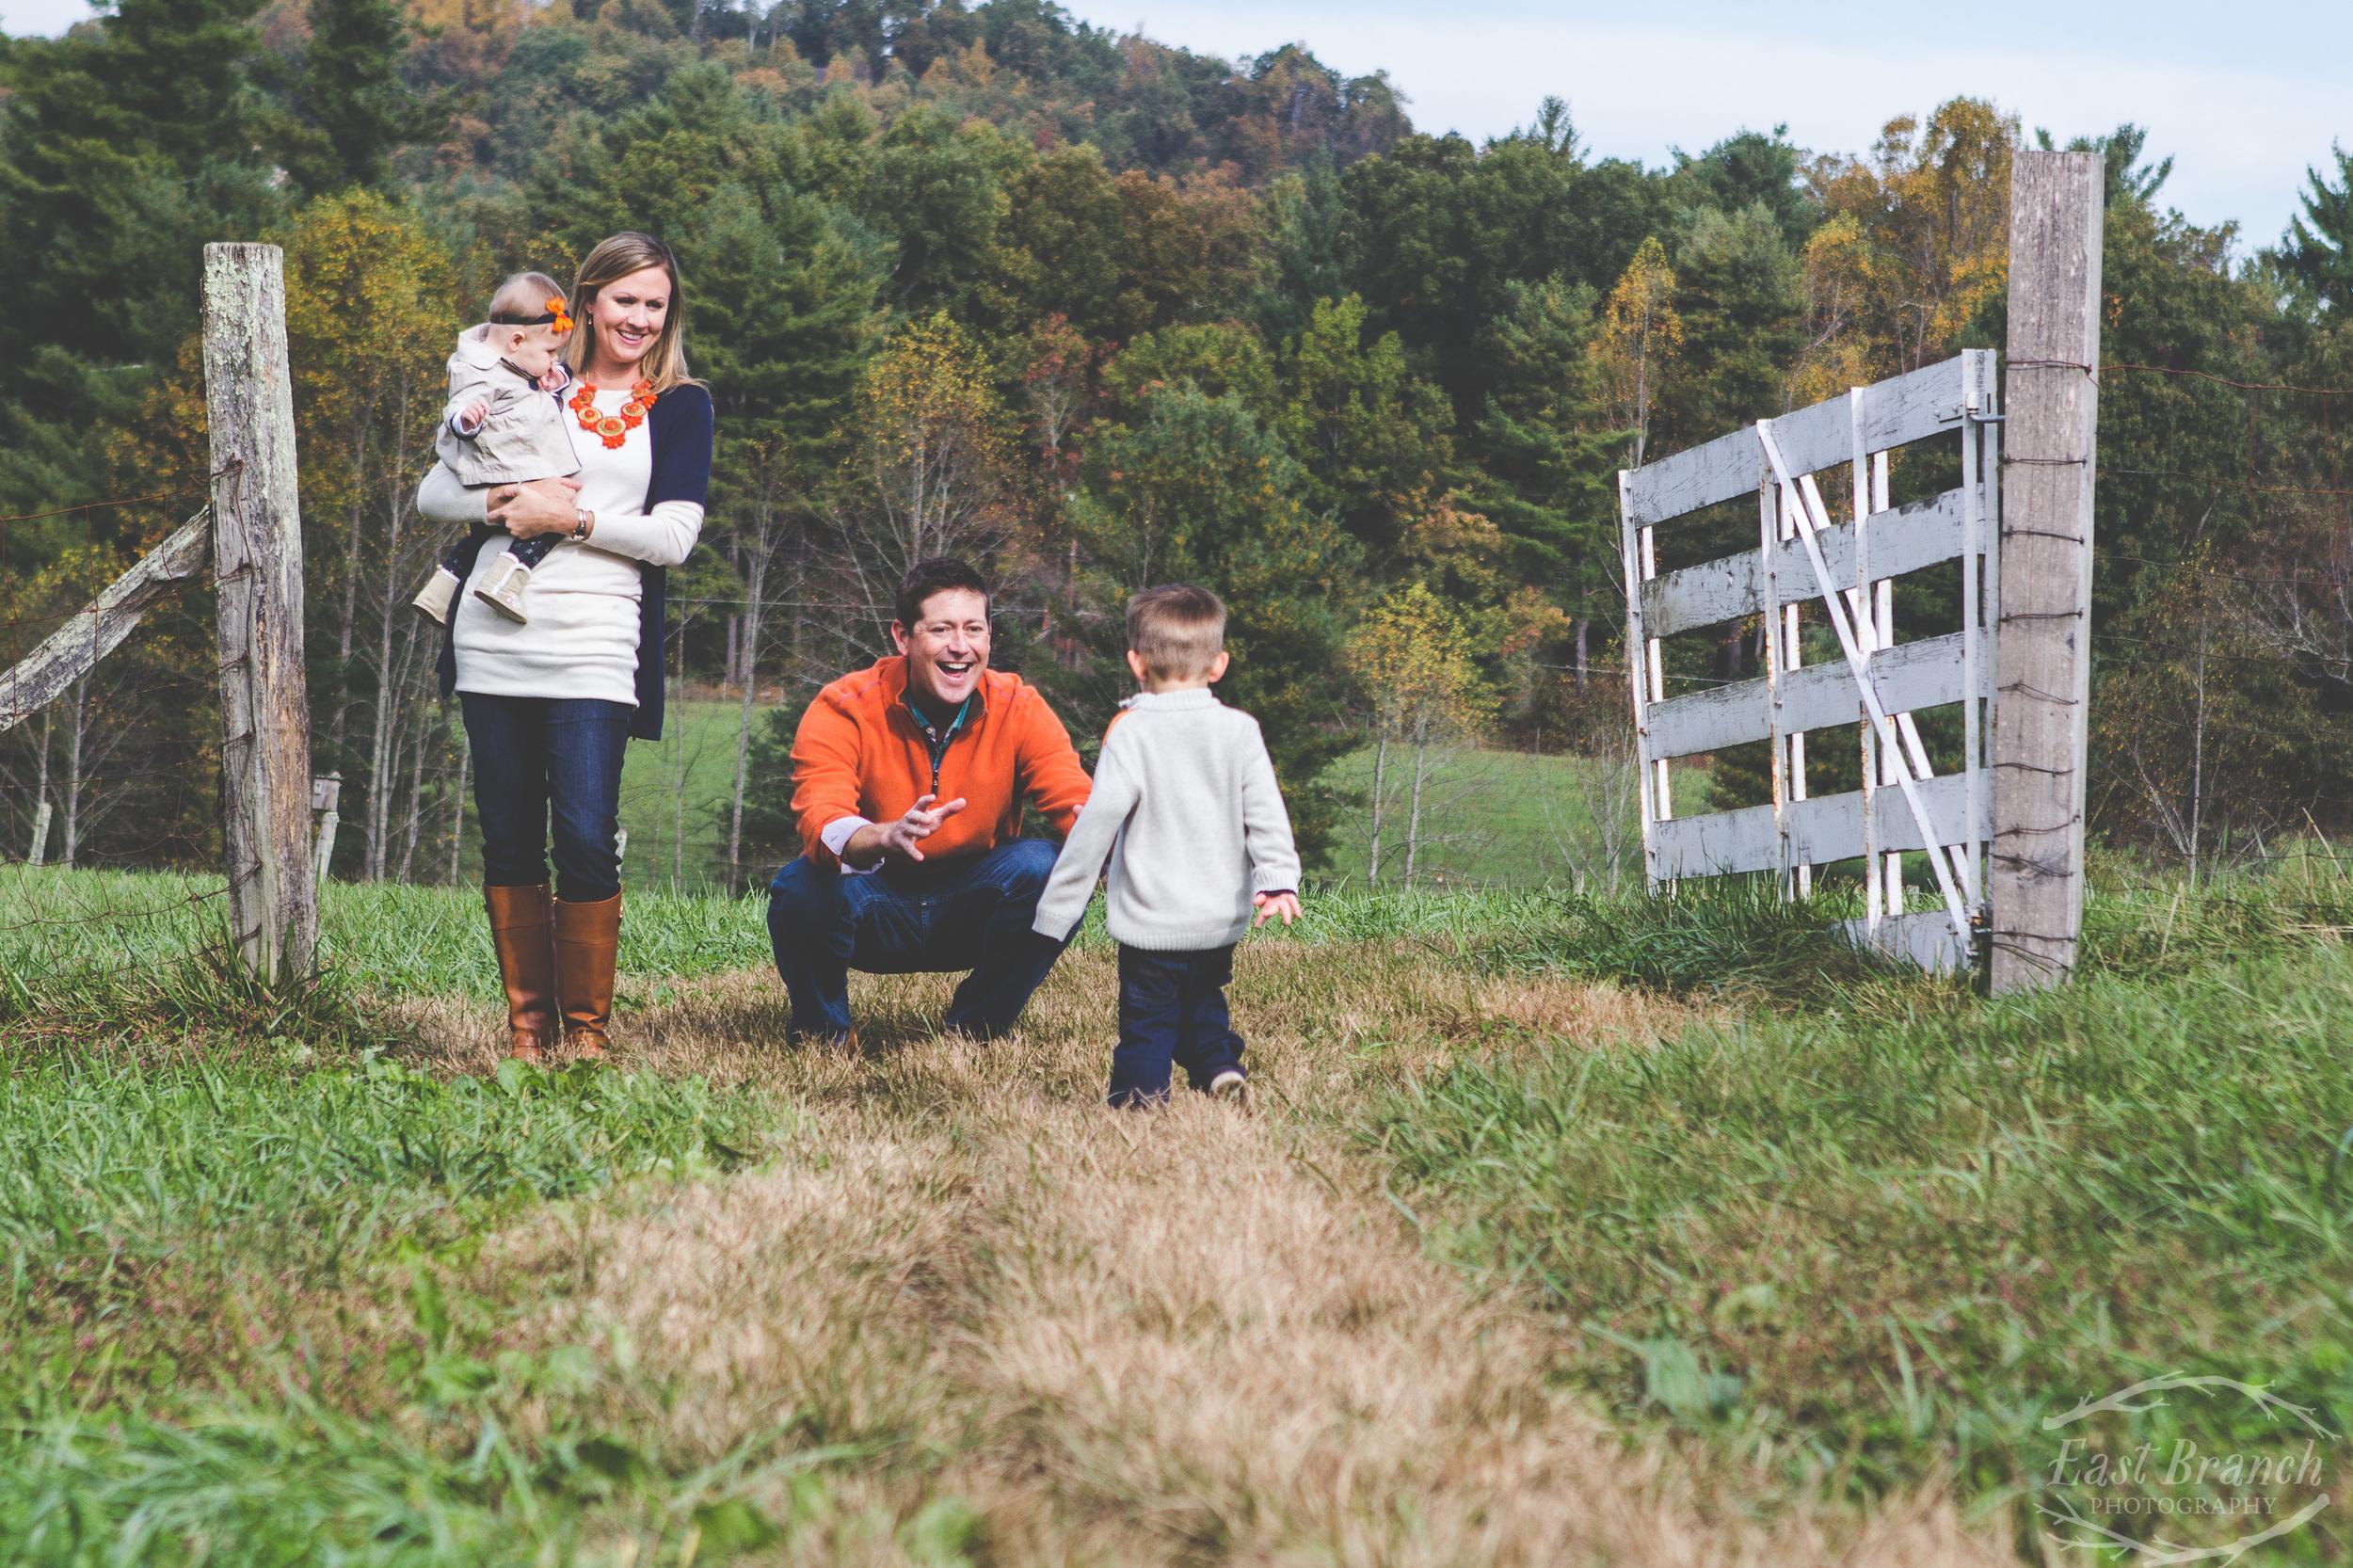 family-in-pasture-autmn